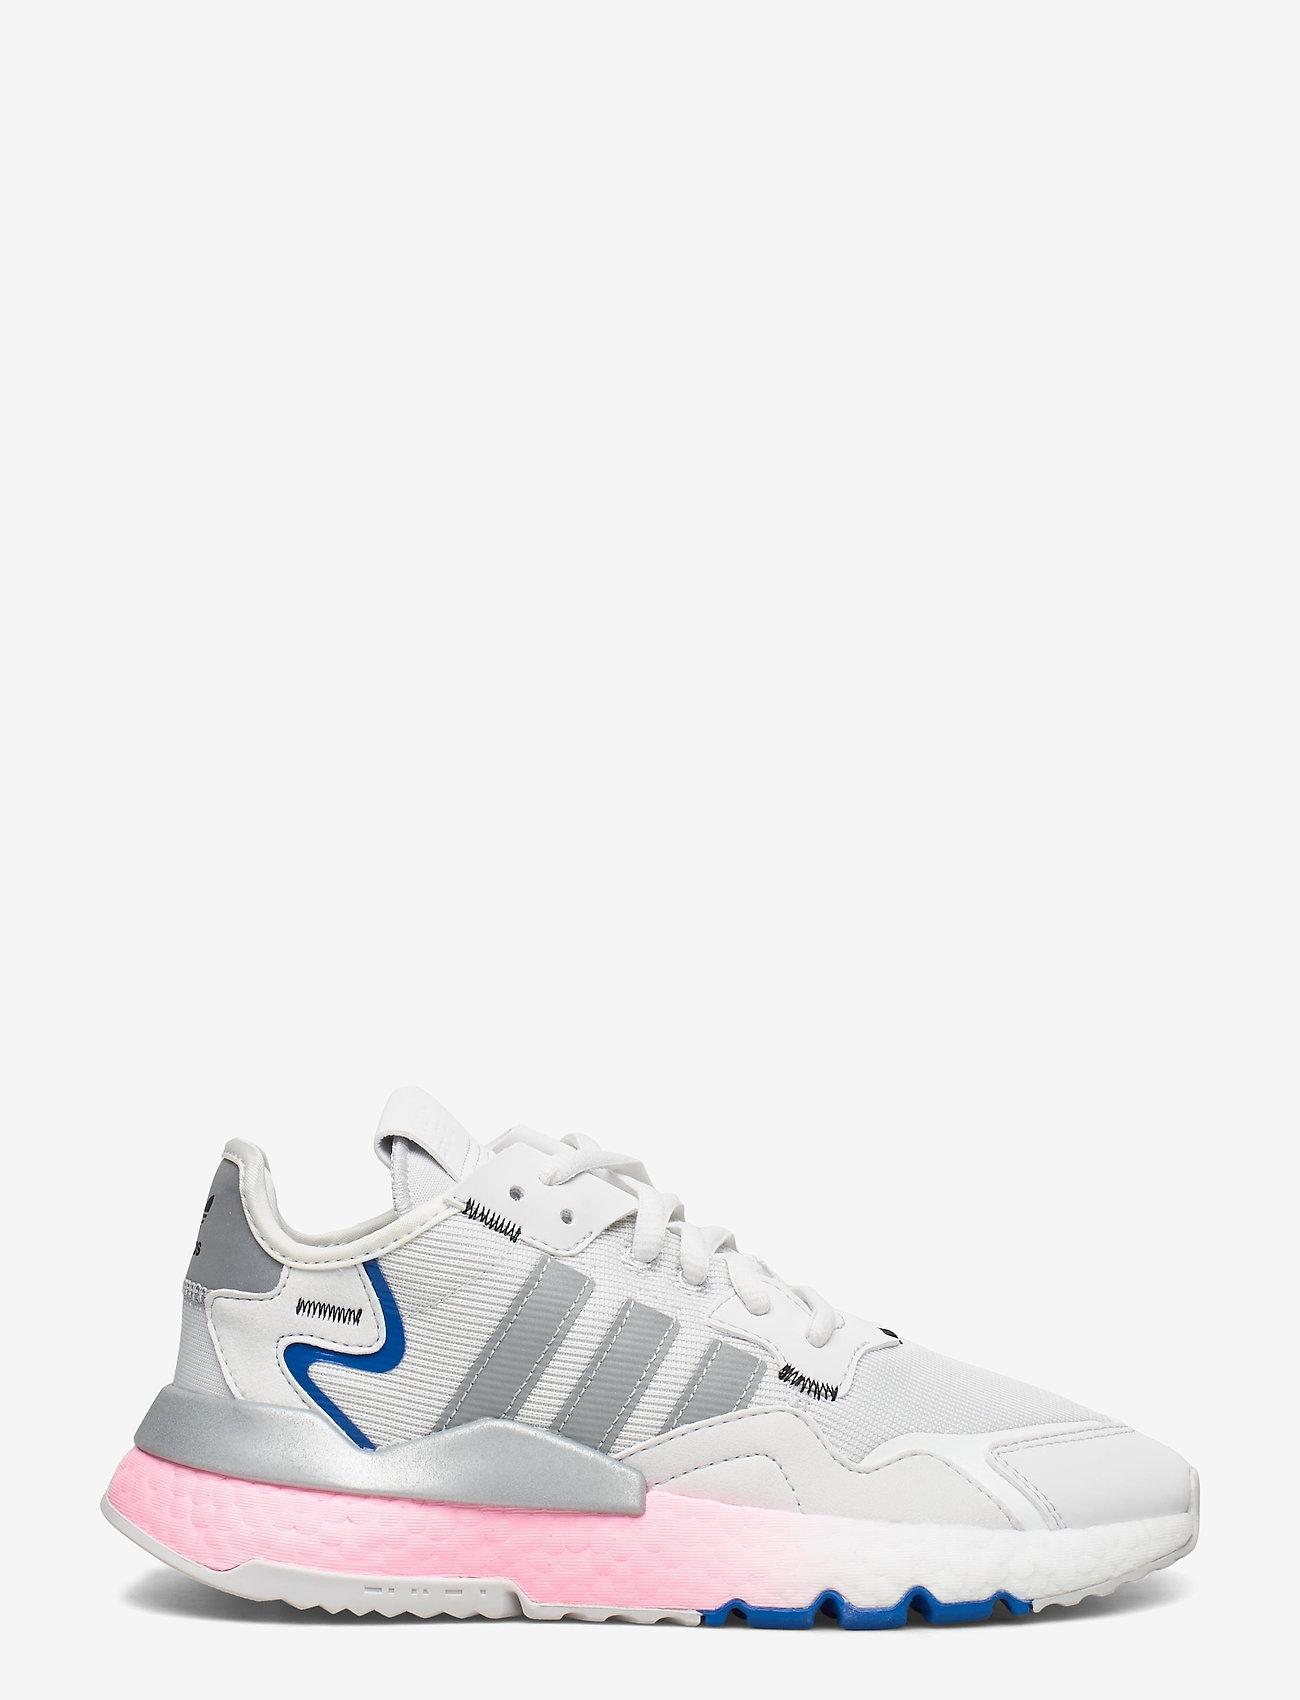 adidas Originals - NITE JOGGER W - chunky sneaker - crywht/silvmt/globlu - 1